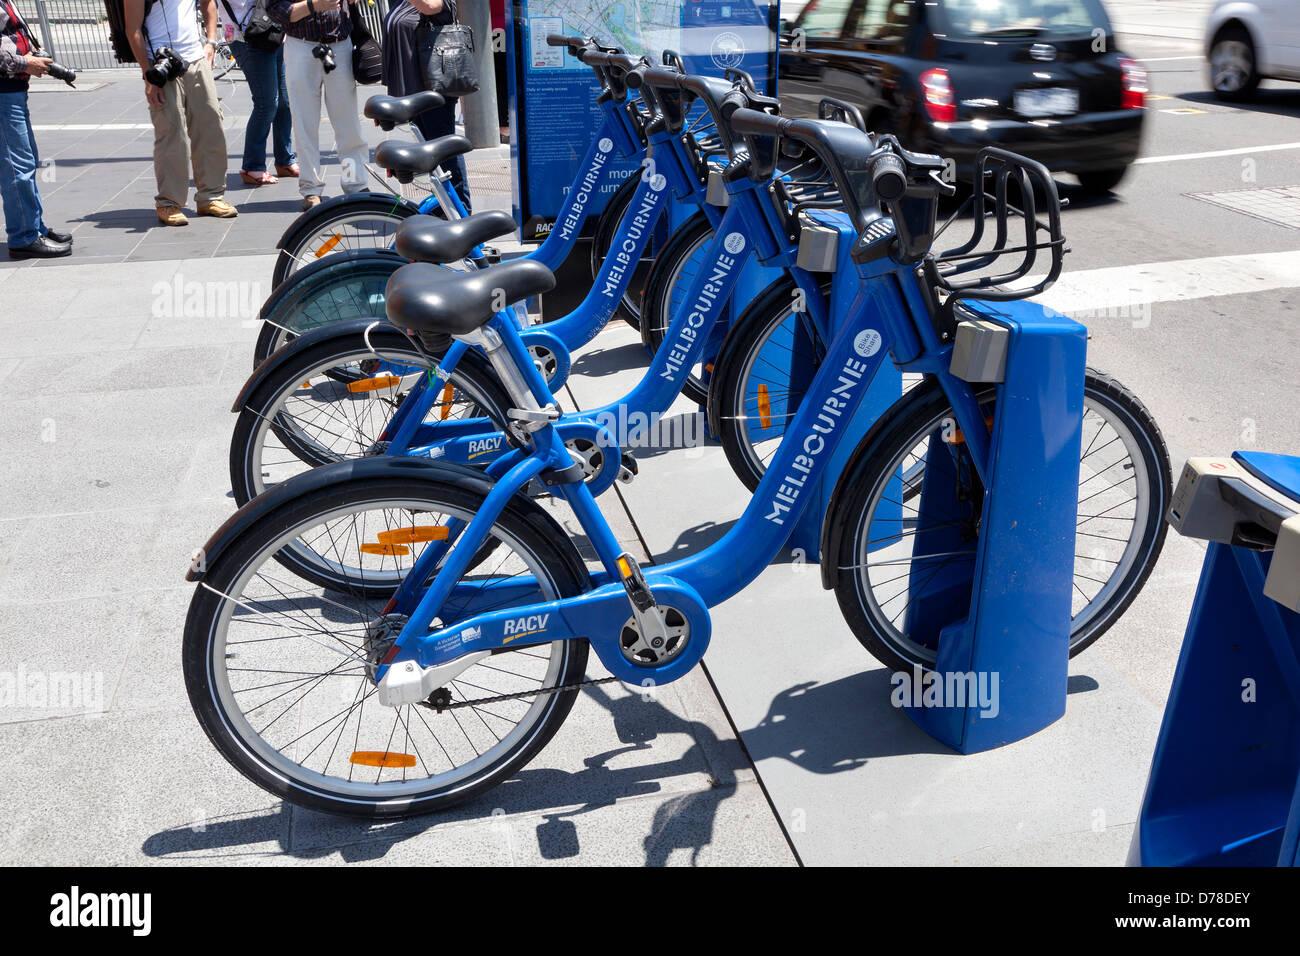 Melbourne bikes on the street near |Federation square, Australia - Stock Image